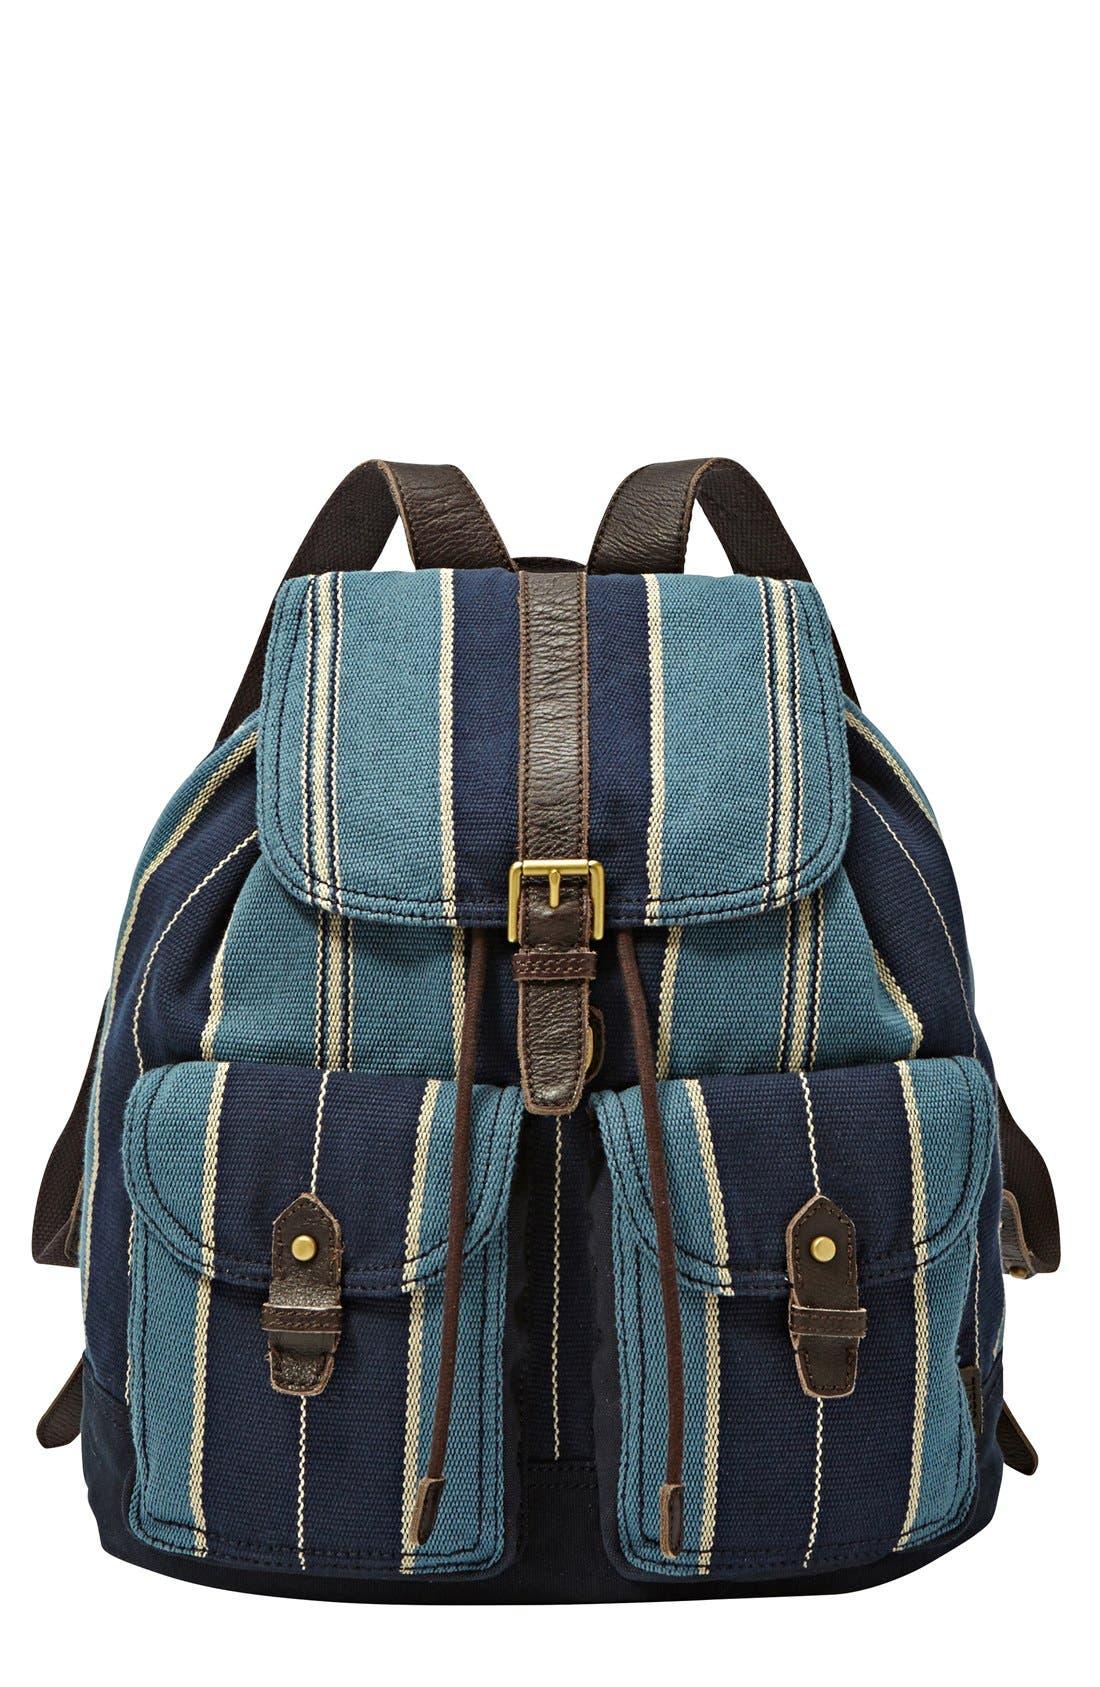 'Estate' Backpack,                             Main thumbnail 1, color,                             490